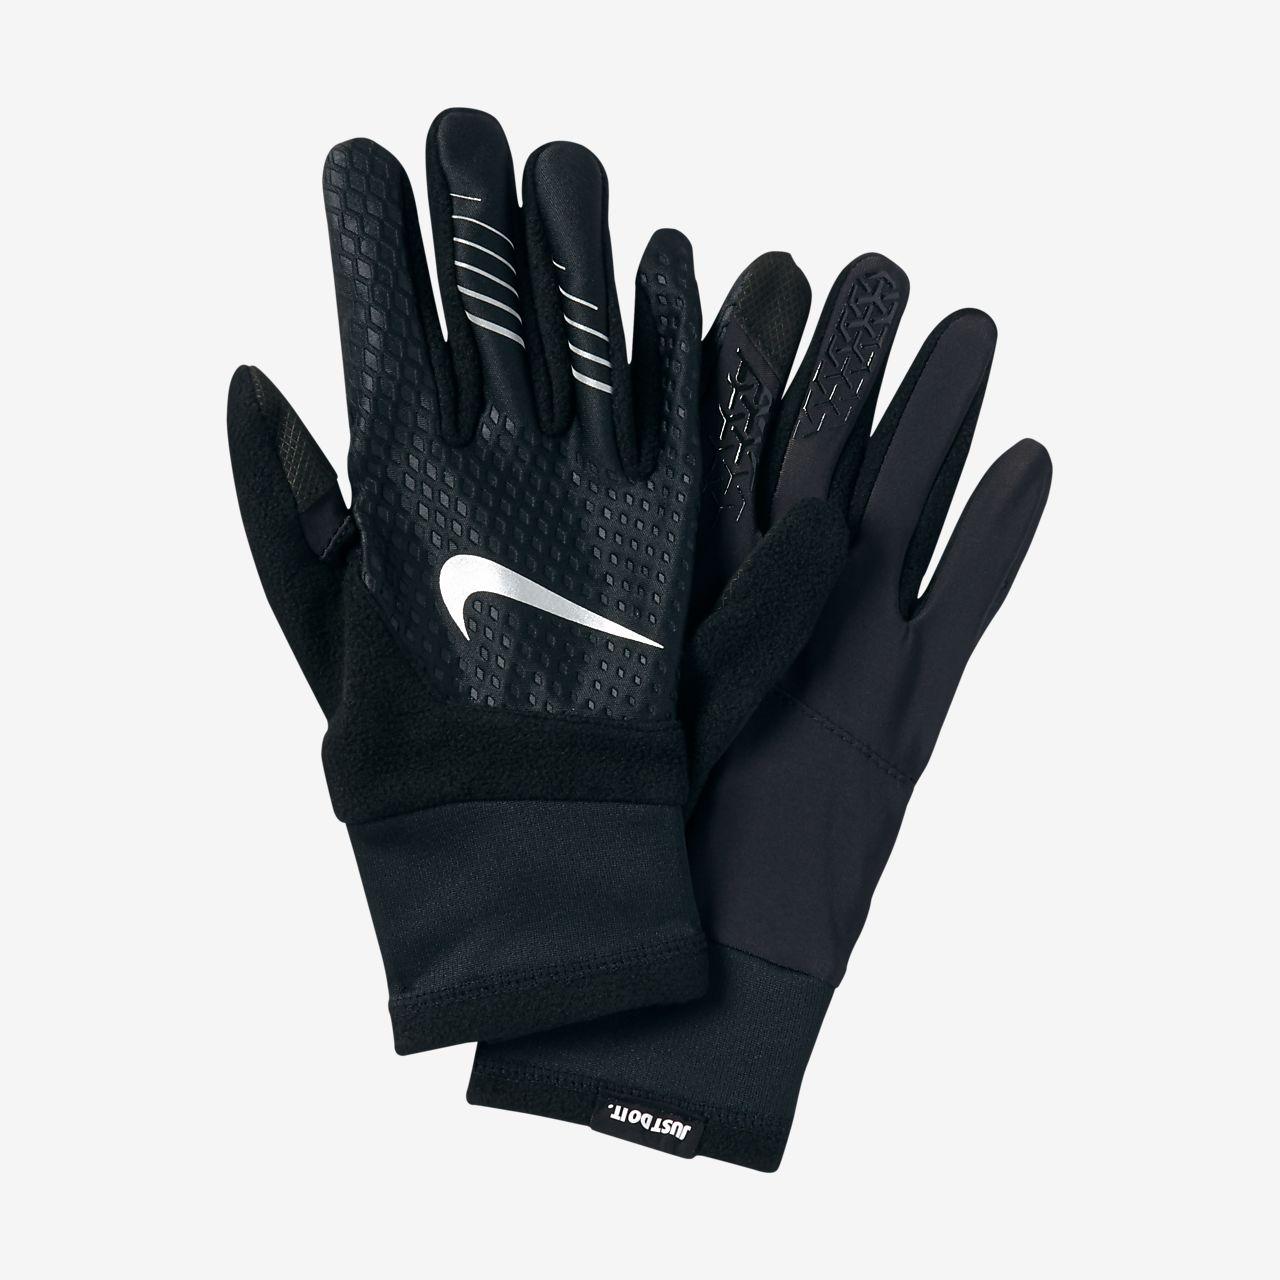 Nike Therma-FIT Elite 2.0 Damen-Laufhandschuhe